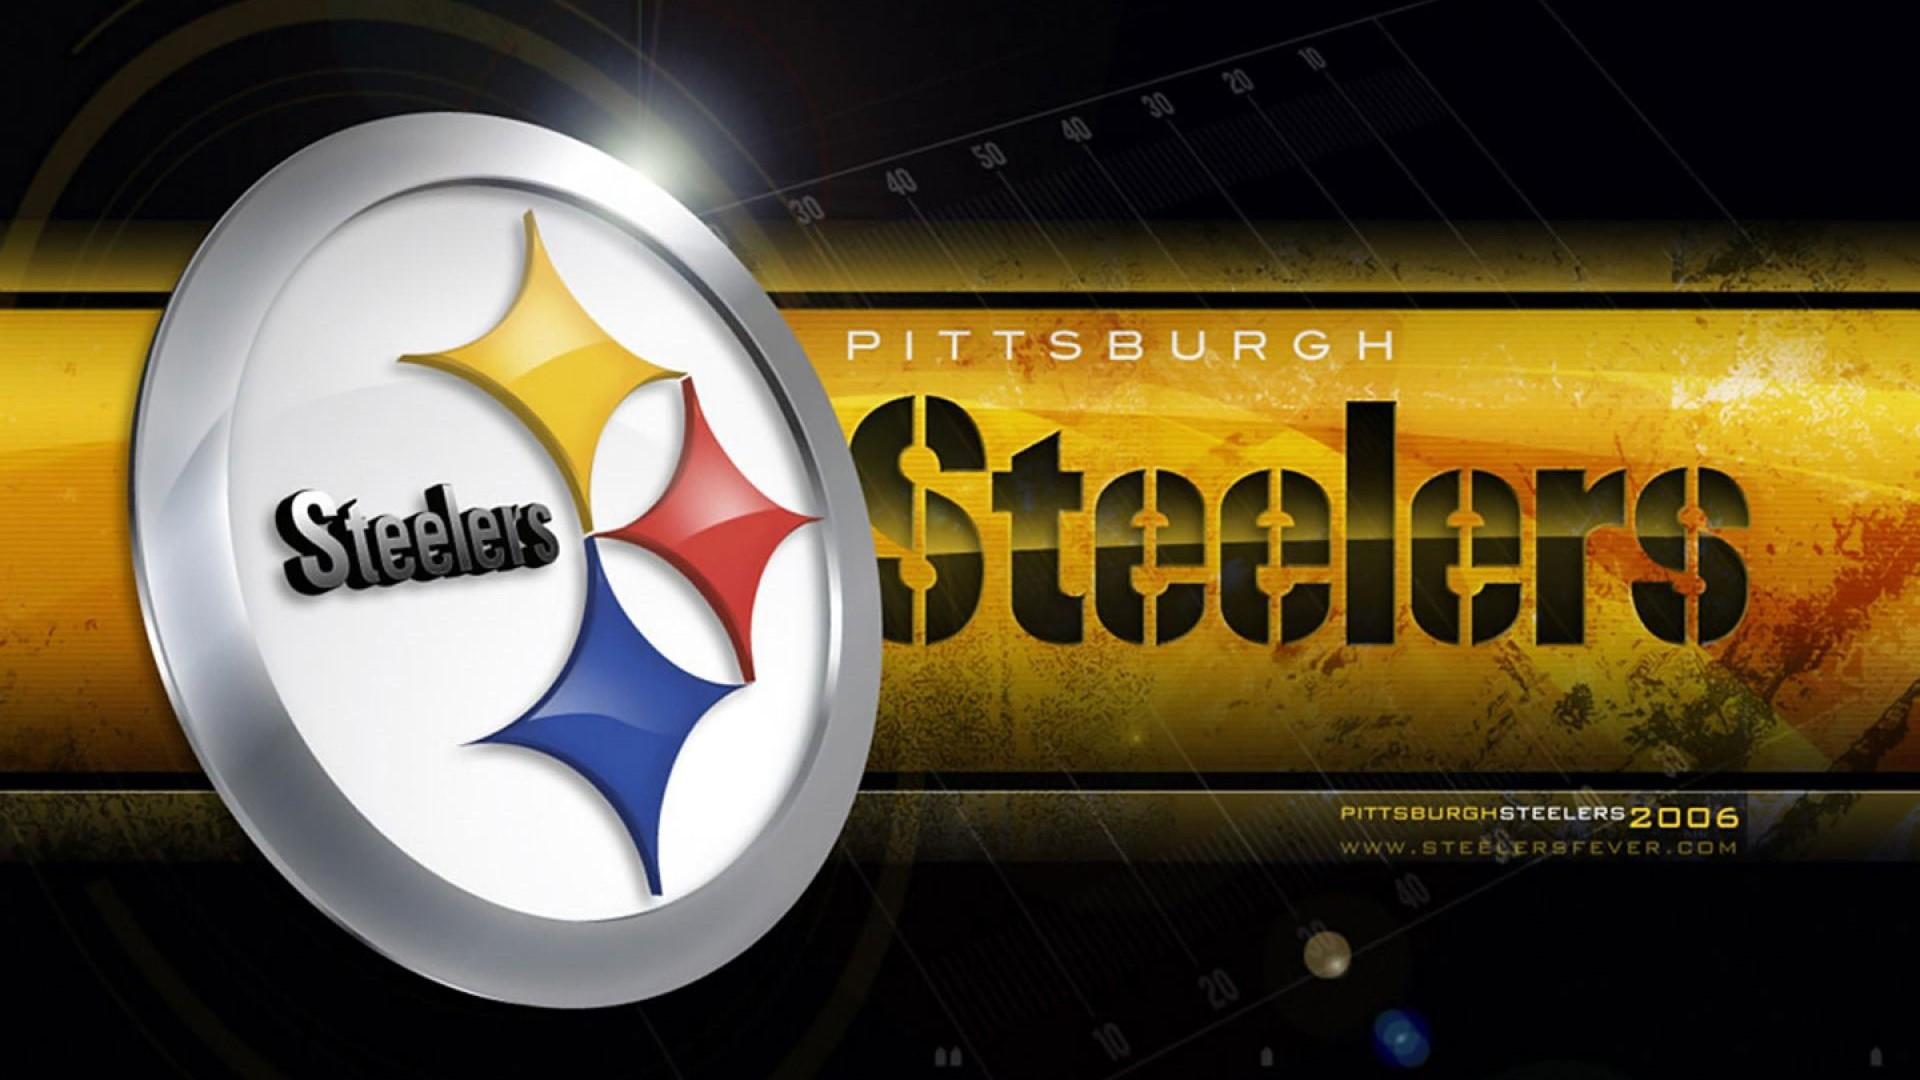 1920x1080 Pittsburgh Steelers Desktop Wallpaper (71+ images)